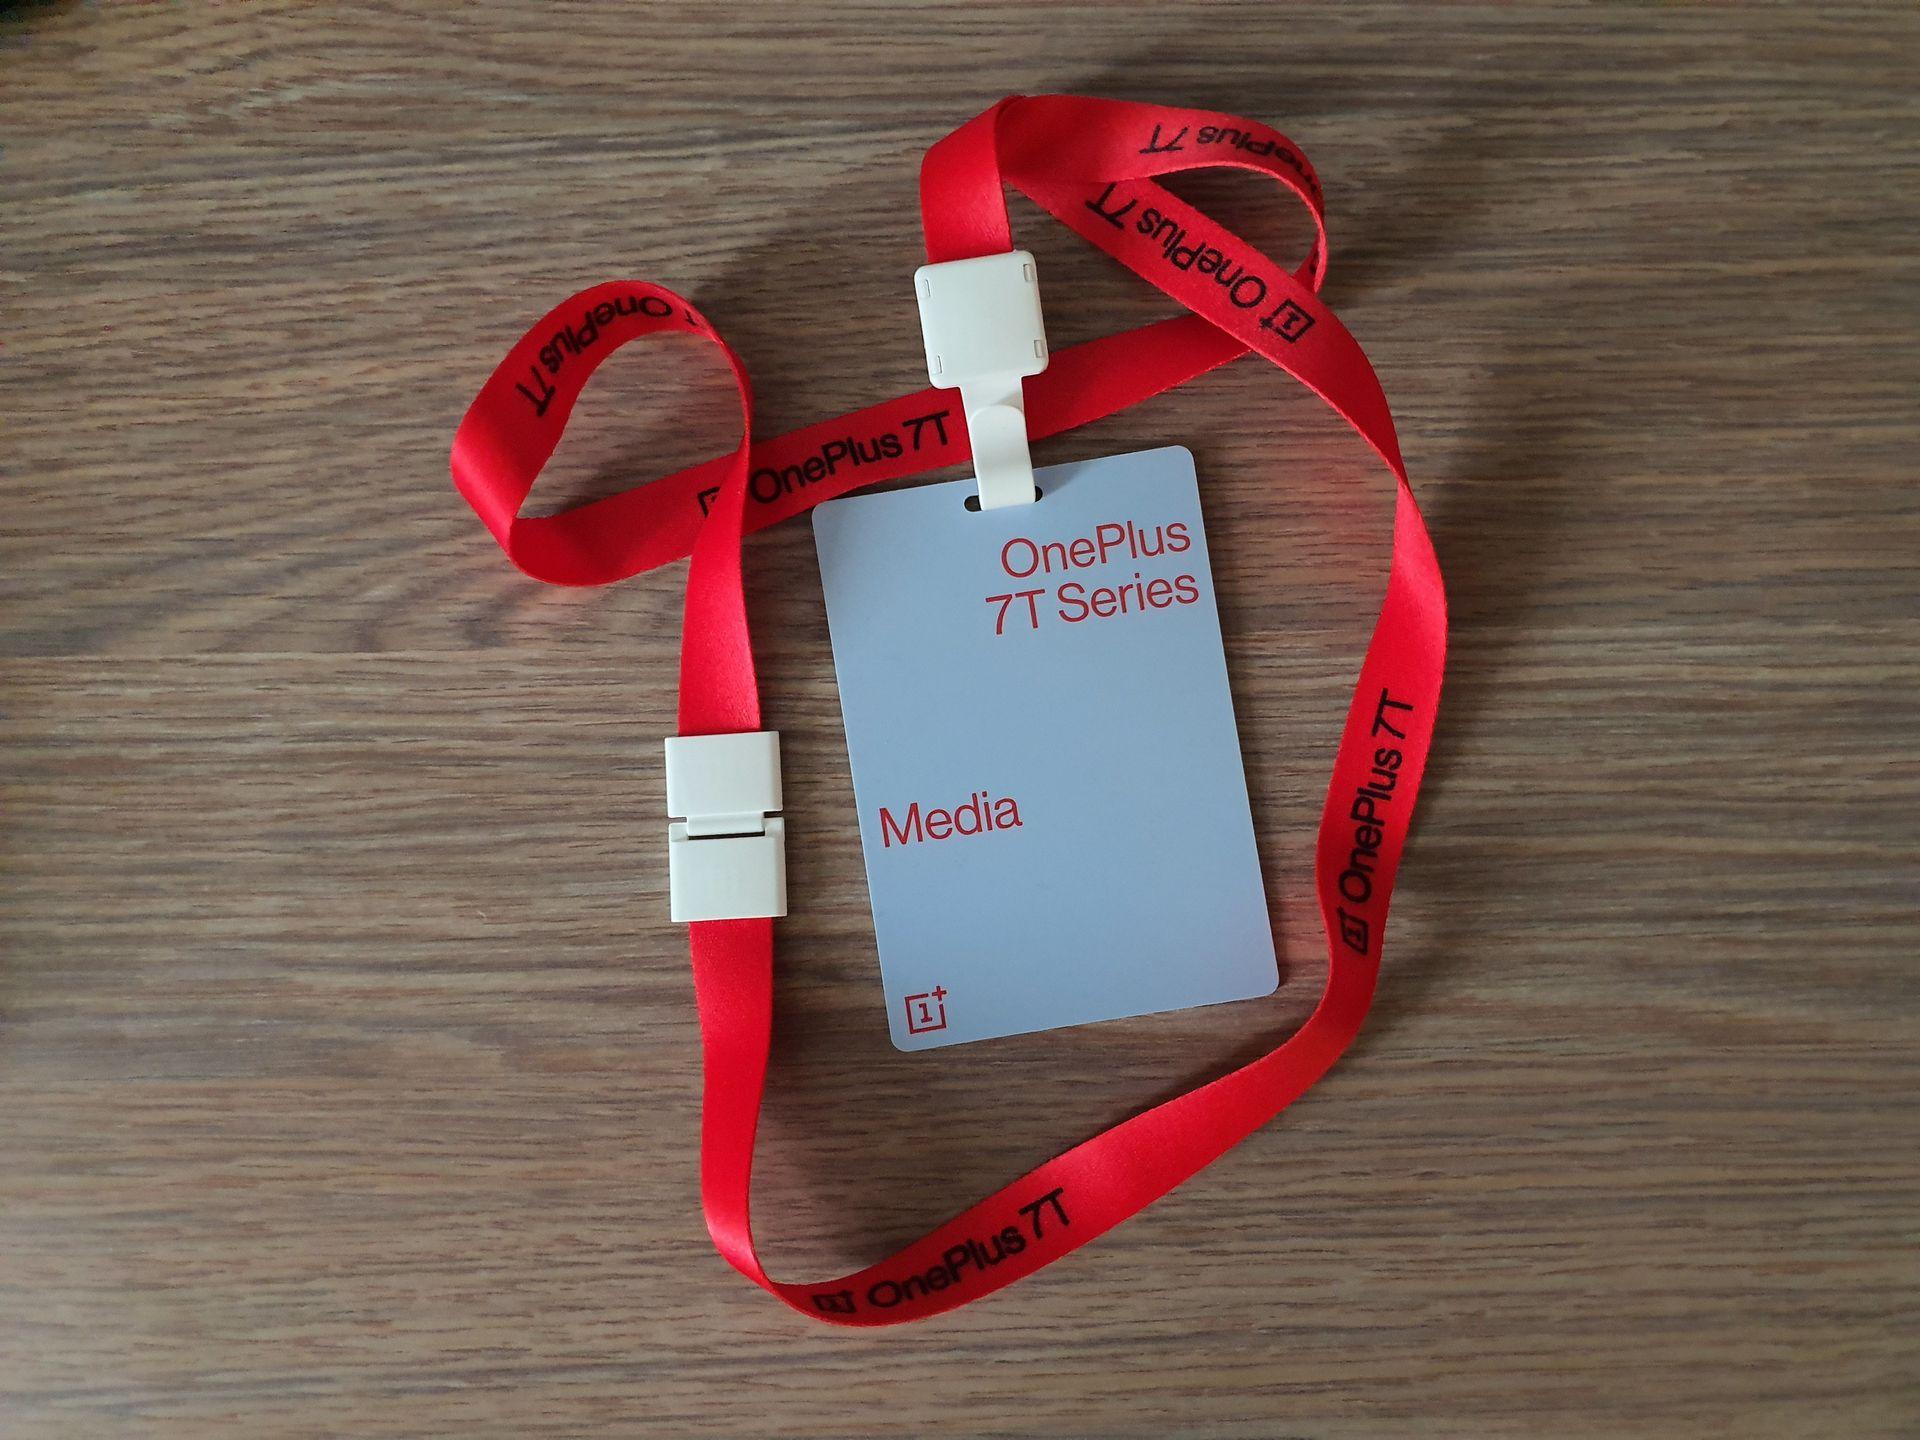 oneplus 7t premiera media badge